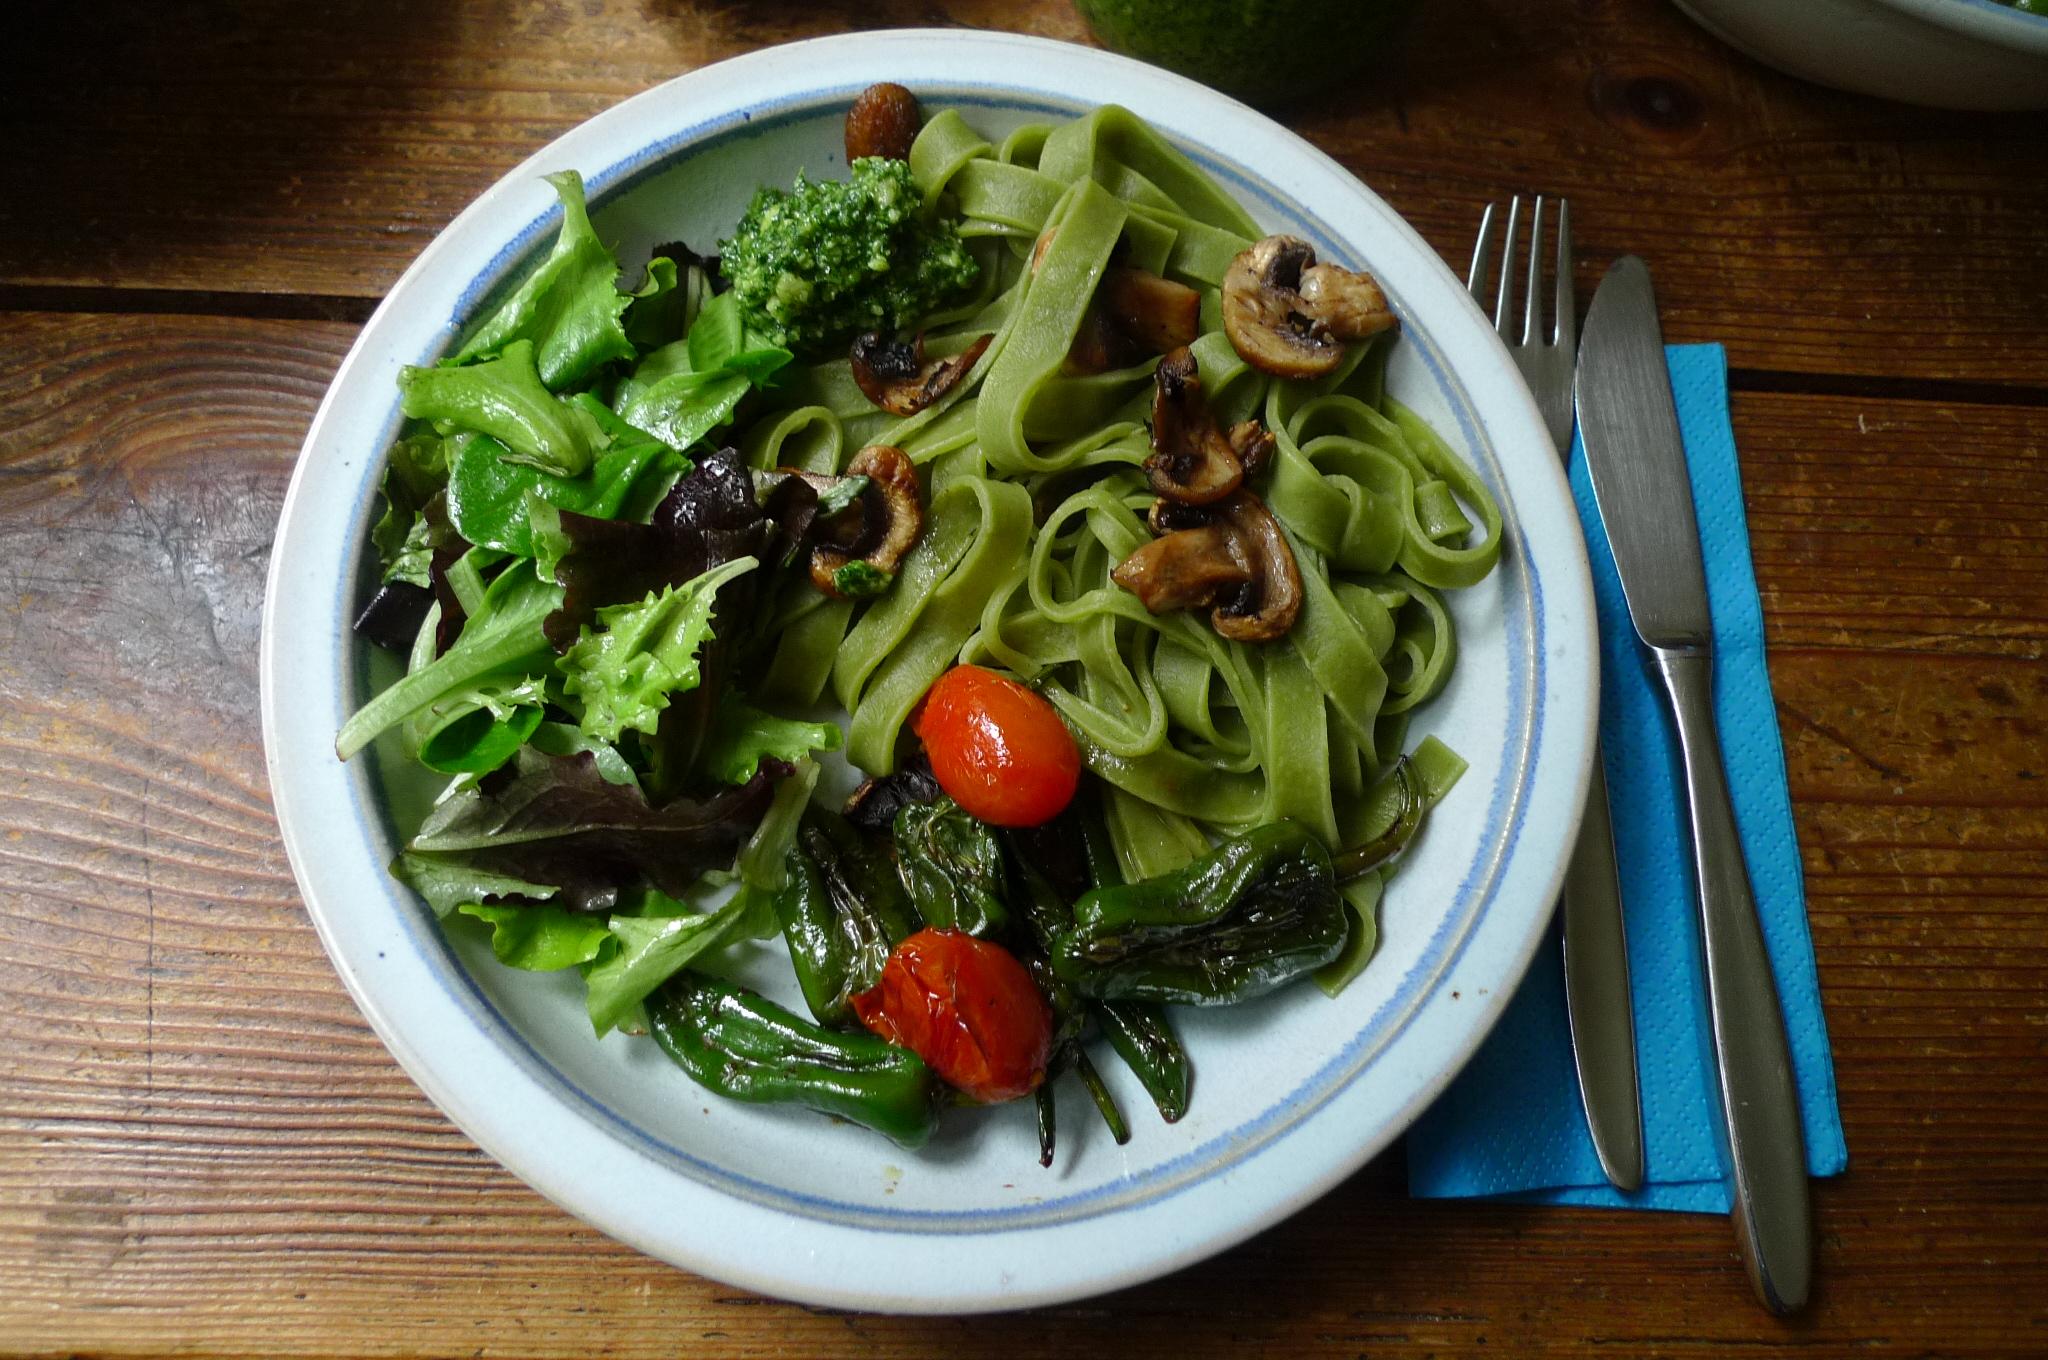 Grüne Nudeln,Ruccolapesto,Pilze,Bratpaprika,Salat-8.3.15   (1)